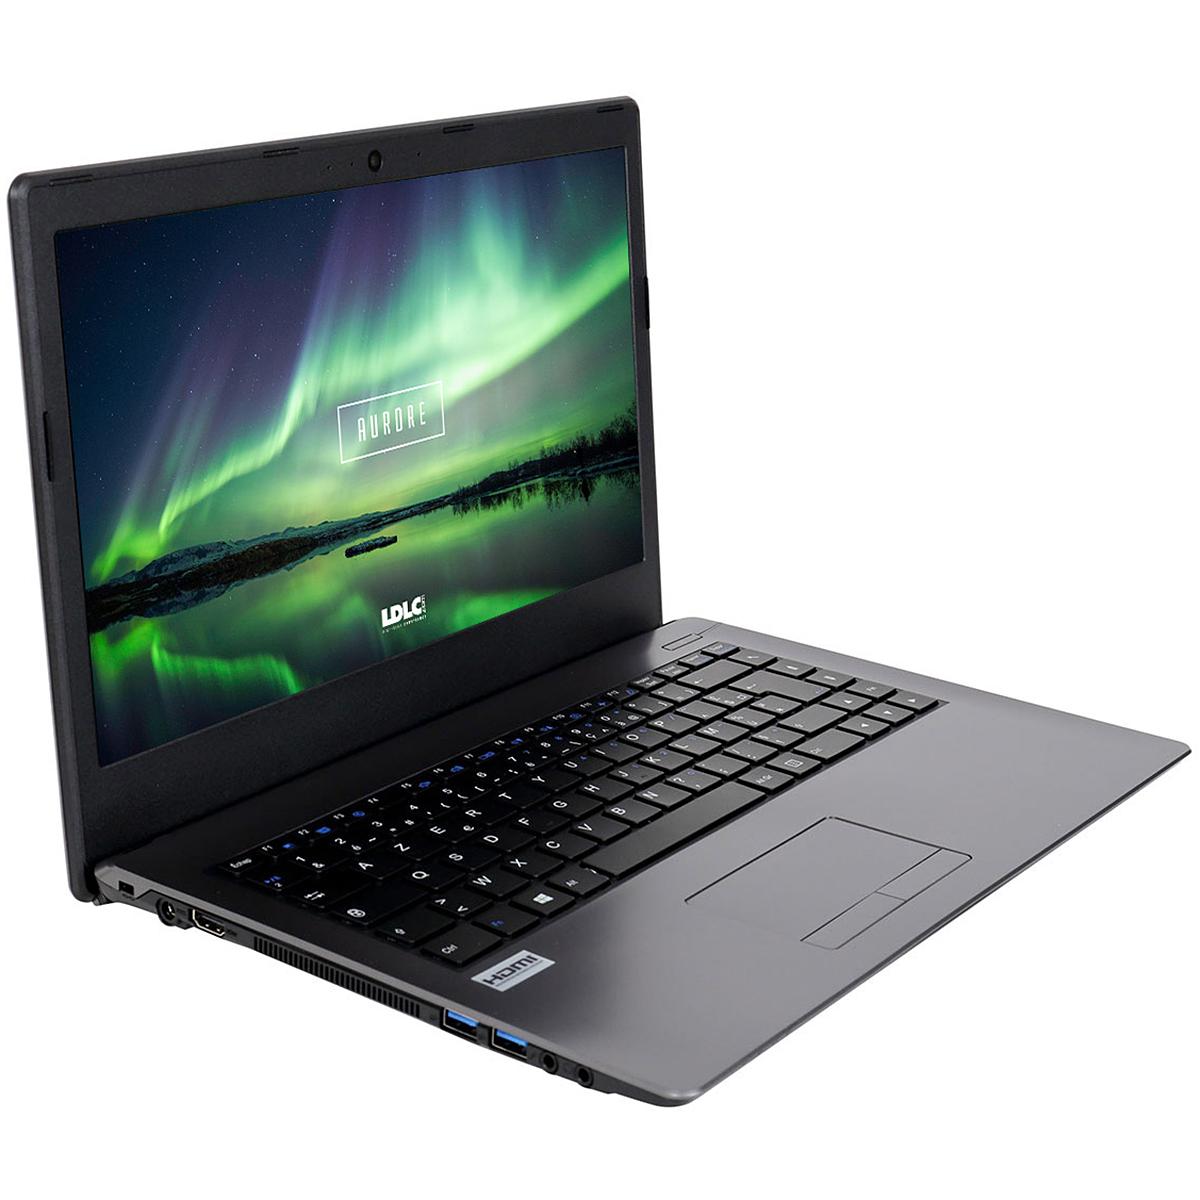 "PC portable LDLC Aurore PC5-4-S2 Intel Pentium 4405U 4 Go SSD 240 Go 14"" LED HD Wi-Fi N/Bluetooth Webcam (sans OS)"